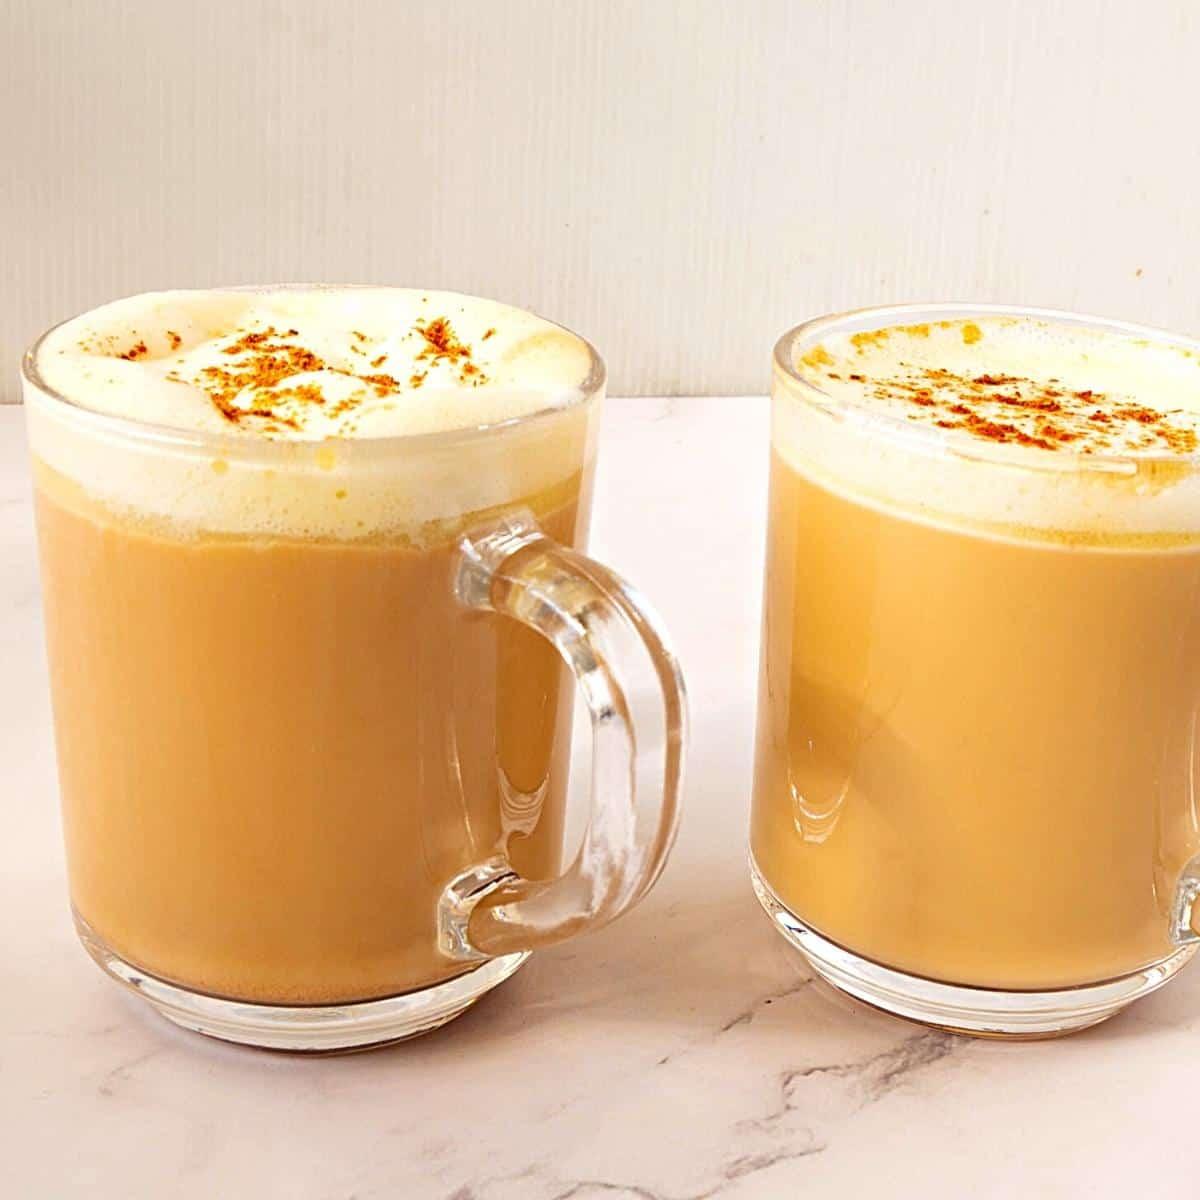 Chai tea latte using chai spice in a cup.